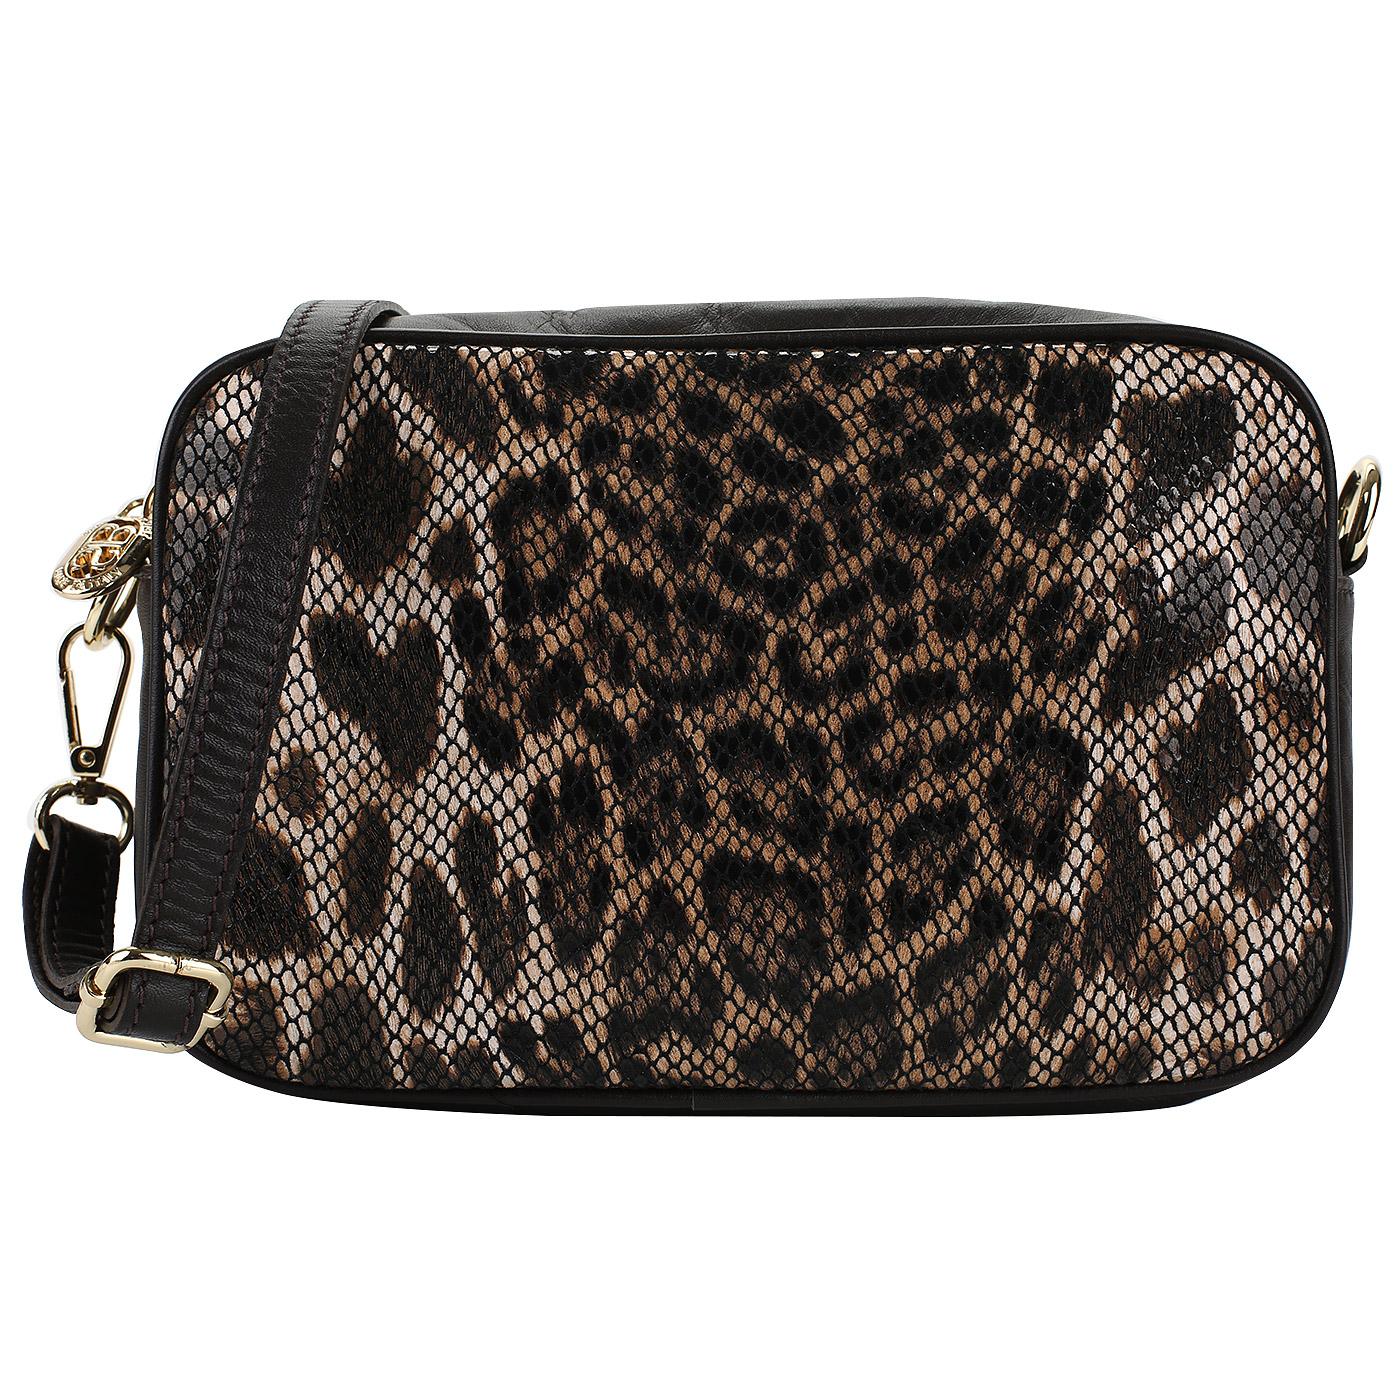 9032d96f0085 Леопардовая сумочка Sara Burglar Noemi Leopard Леопардовая сумочка Sara  Burglar Noemi Leopard ...